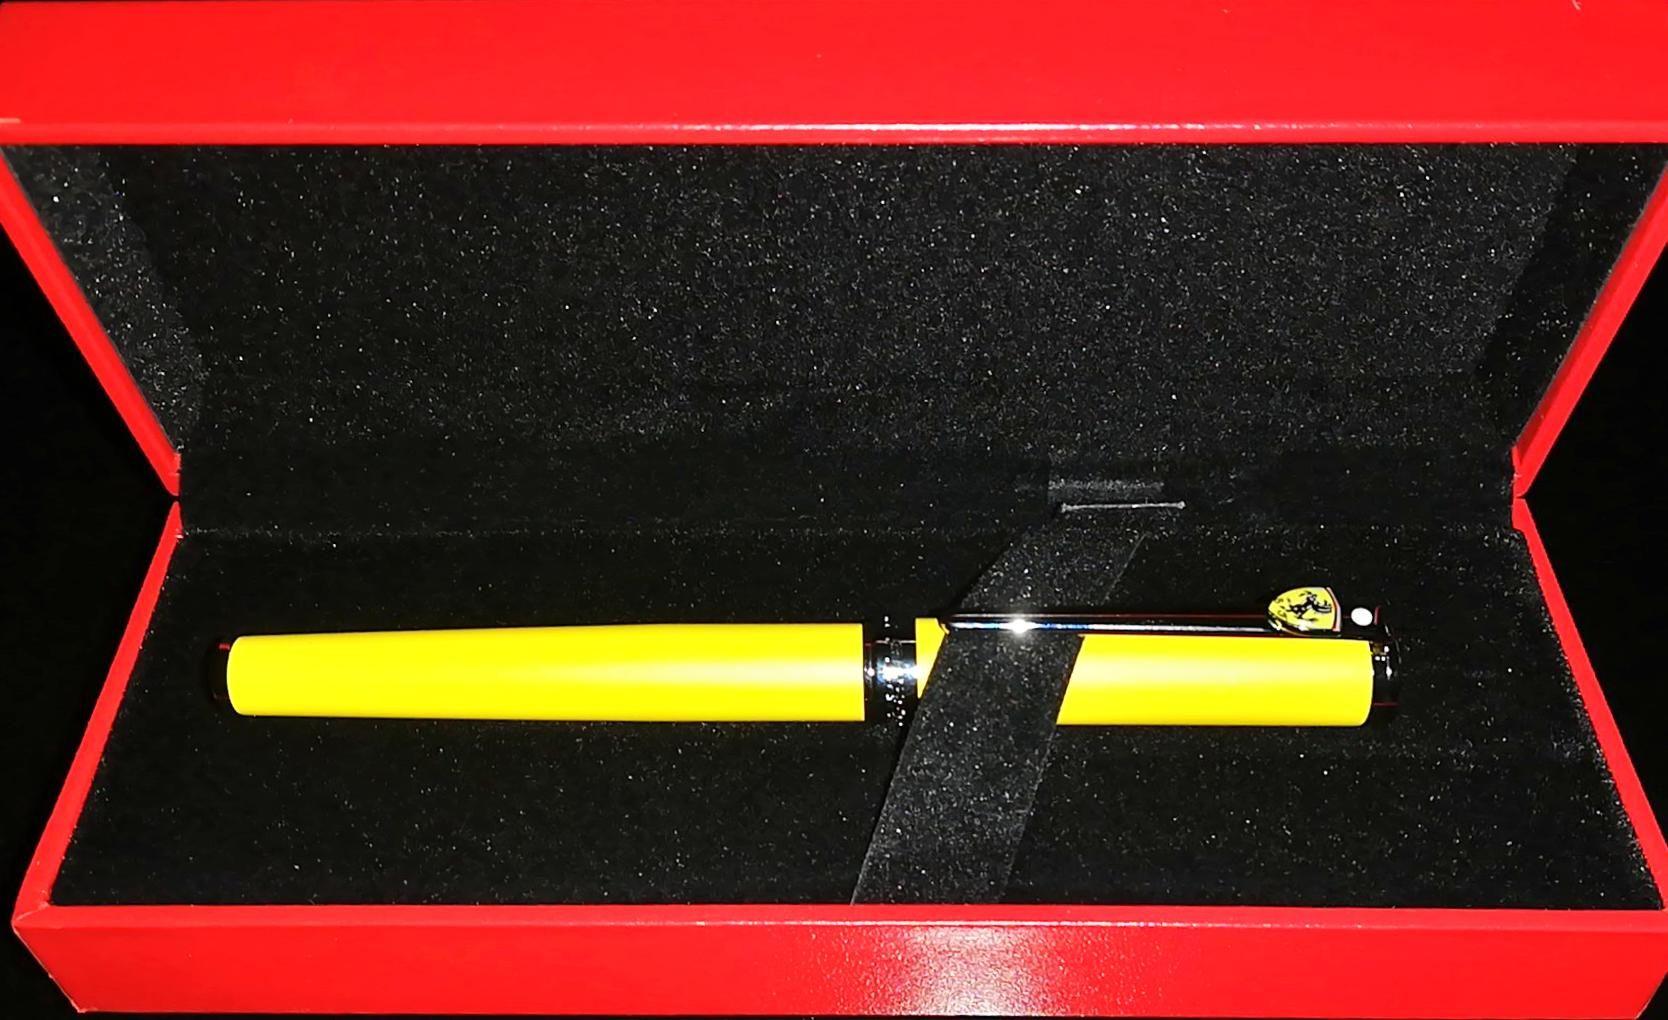 Pióro kulkowe Sheaffers Ferrari Yellow